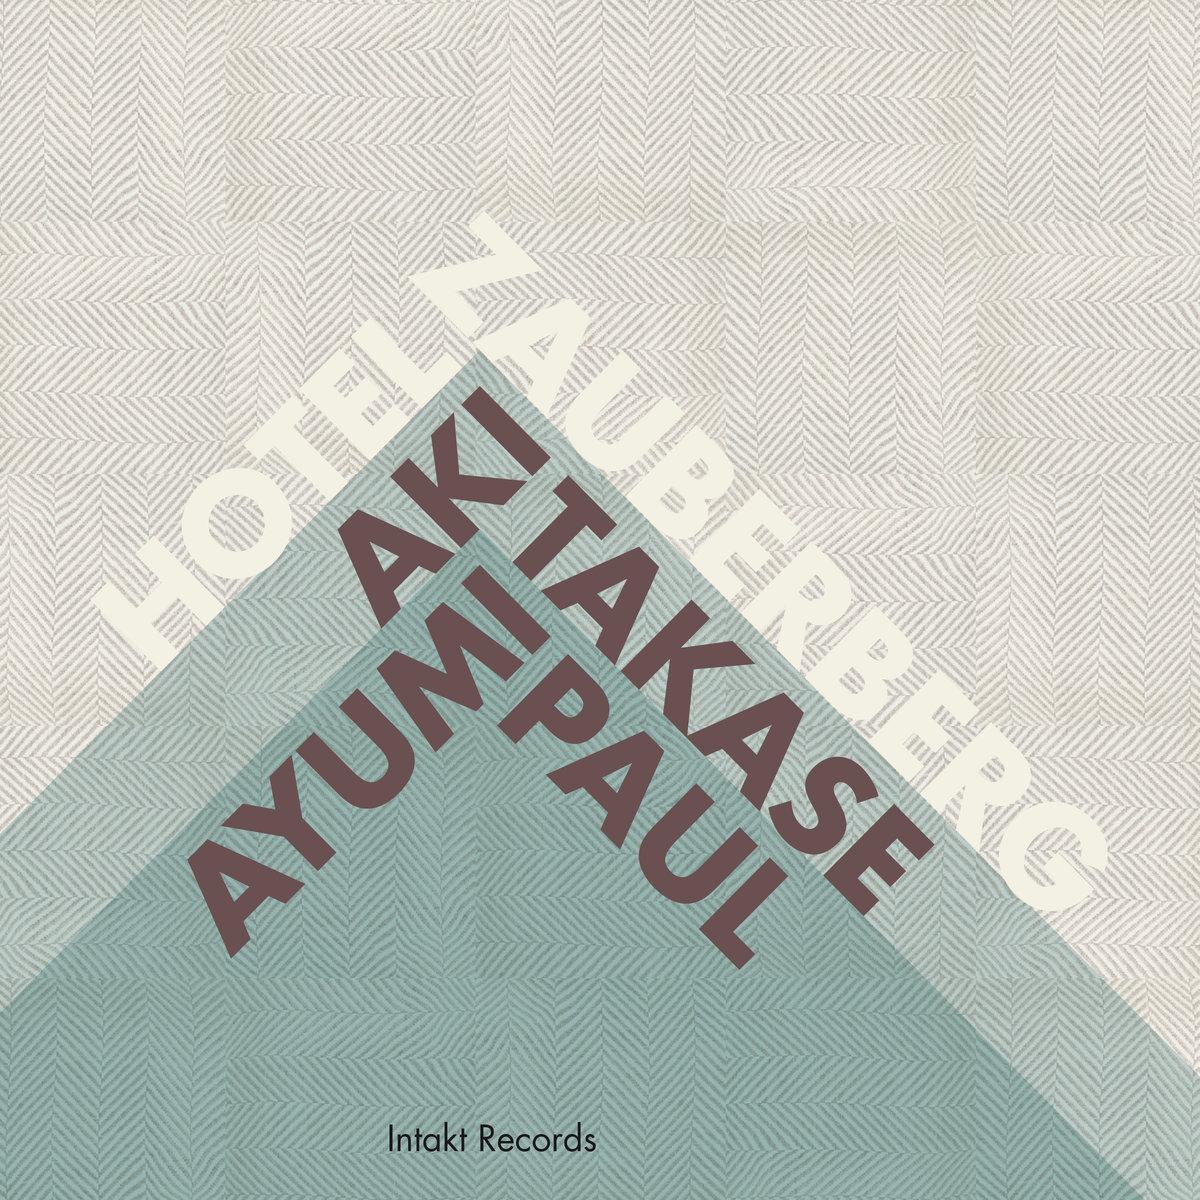 Takase, Aki / Paul Ayumi : Hotel Zauberberg (Intakt)